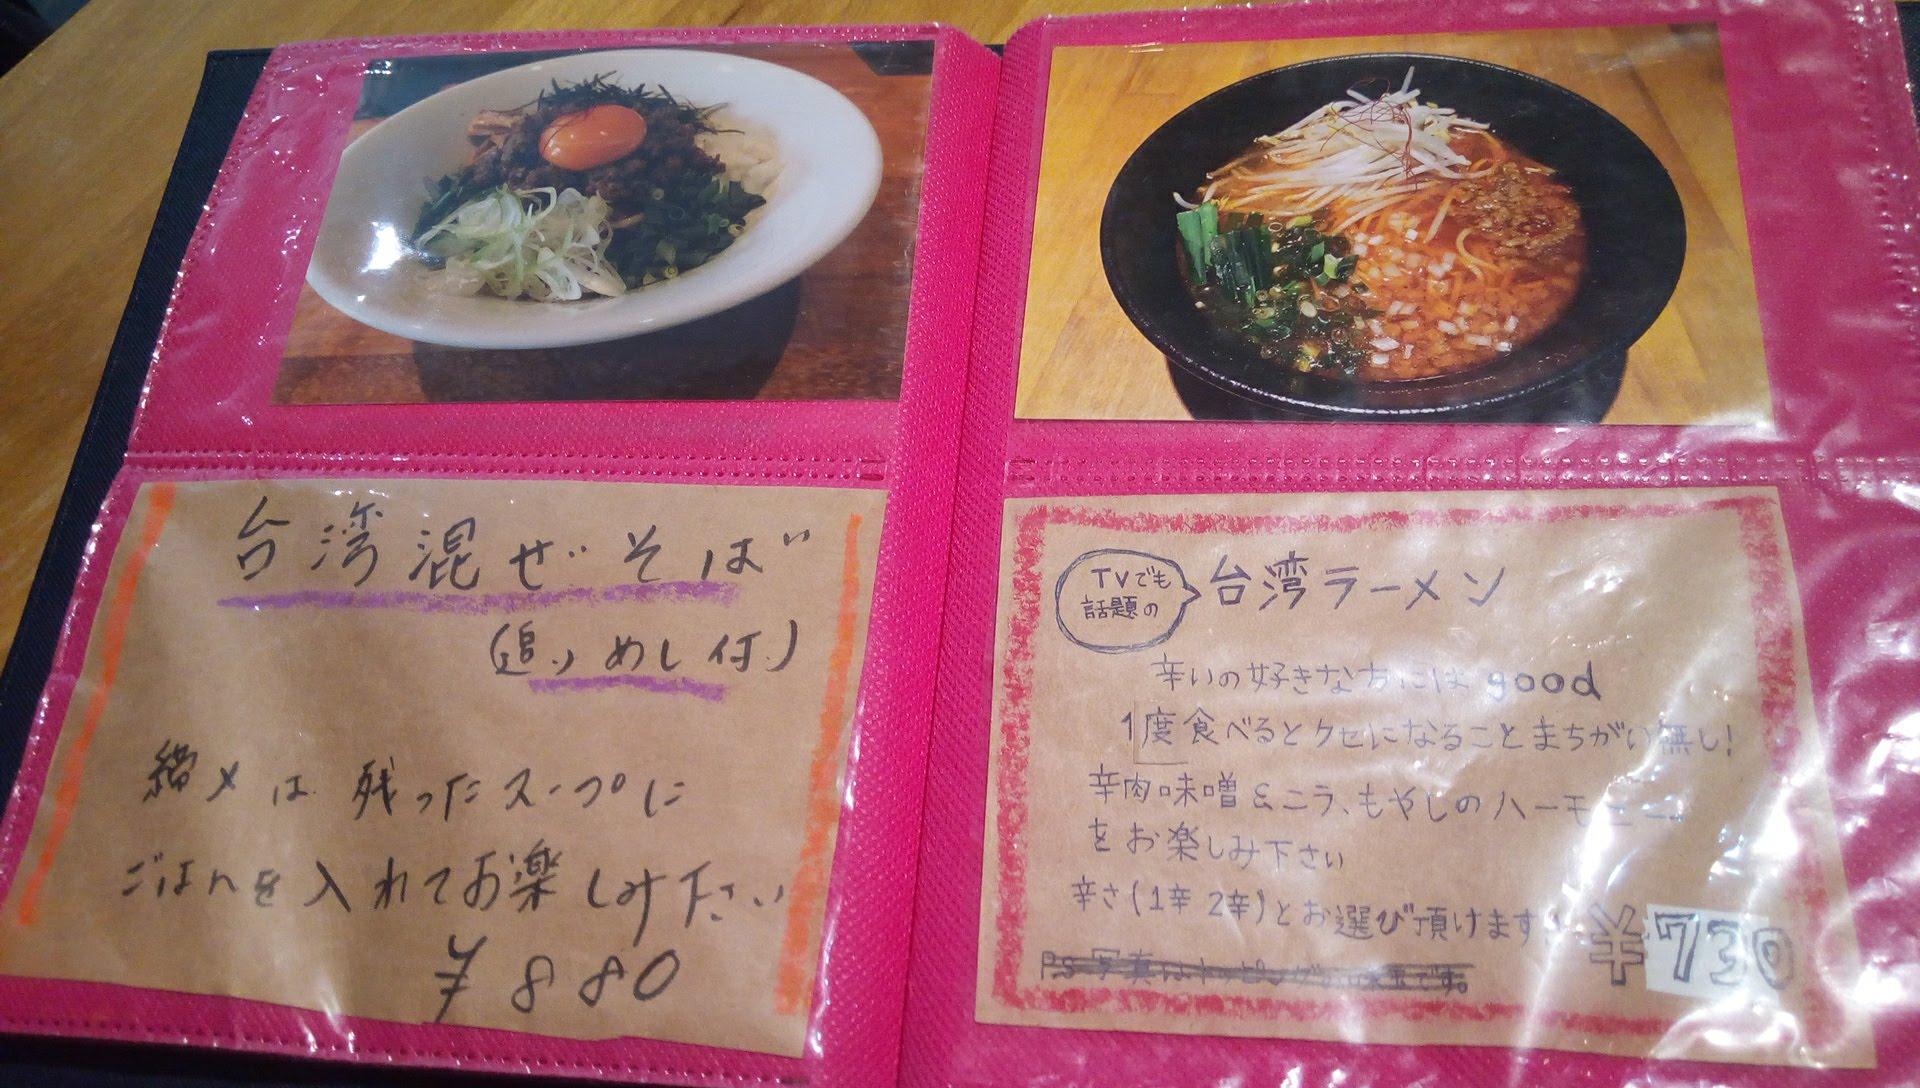 The menu of Menya-Gochi 3